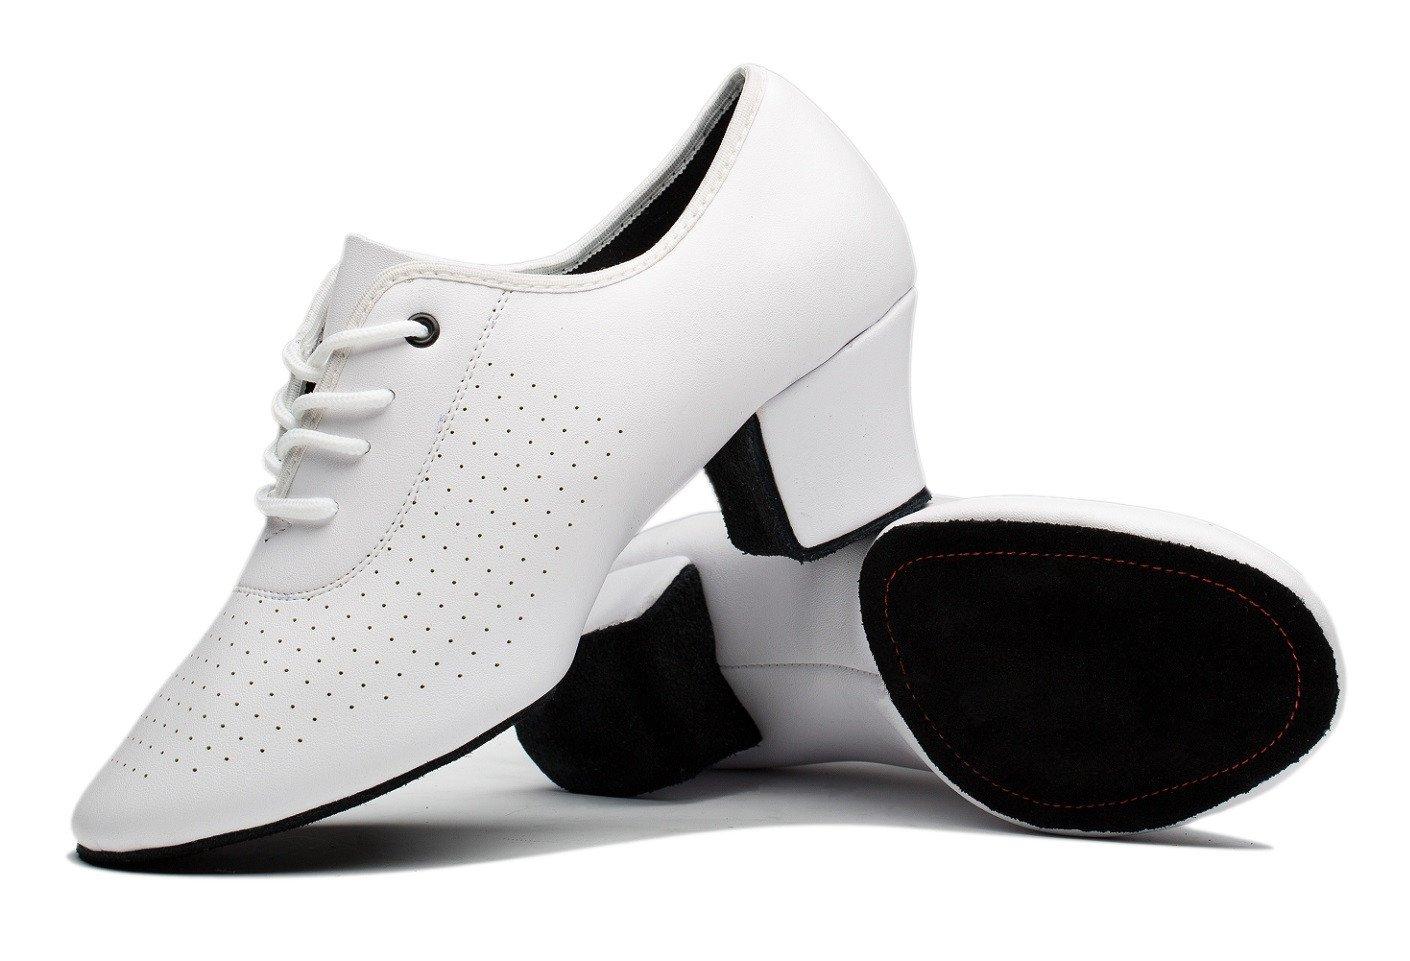 Gogodance Women's Latin Salsa Wedding Dance Shoes Lady's Ballroom Dancing Sneaker White Leather (6US/37)